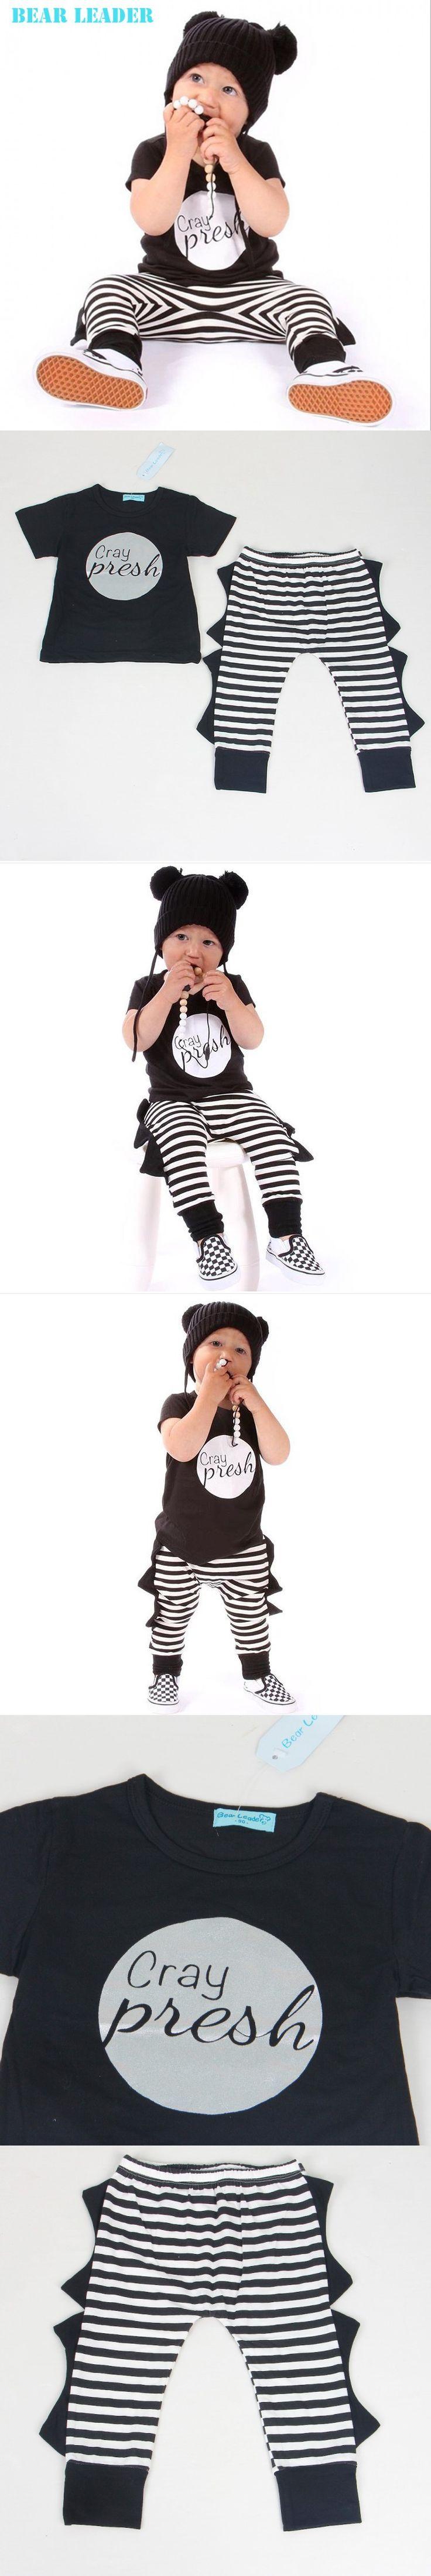 Bear Leader Baby Boys Clothing Sets 2016 New Summer&Spring Boy dinosaur Suit Black Letter Short Sleeve+Striped pants 2pcs Suits